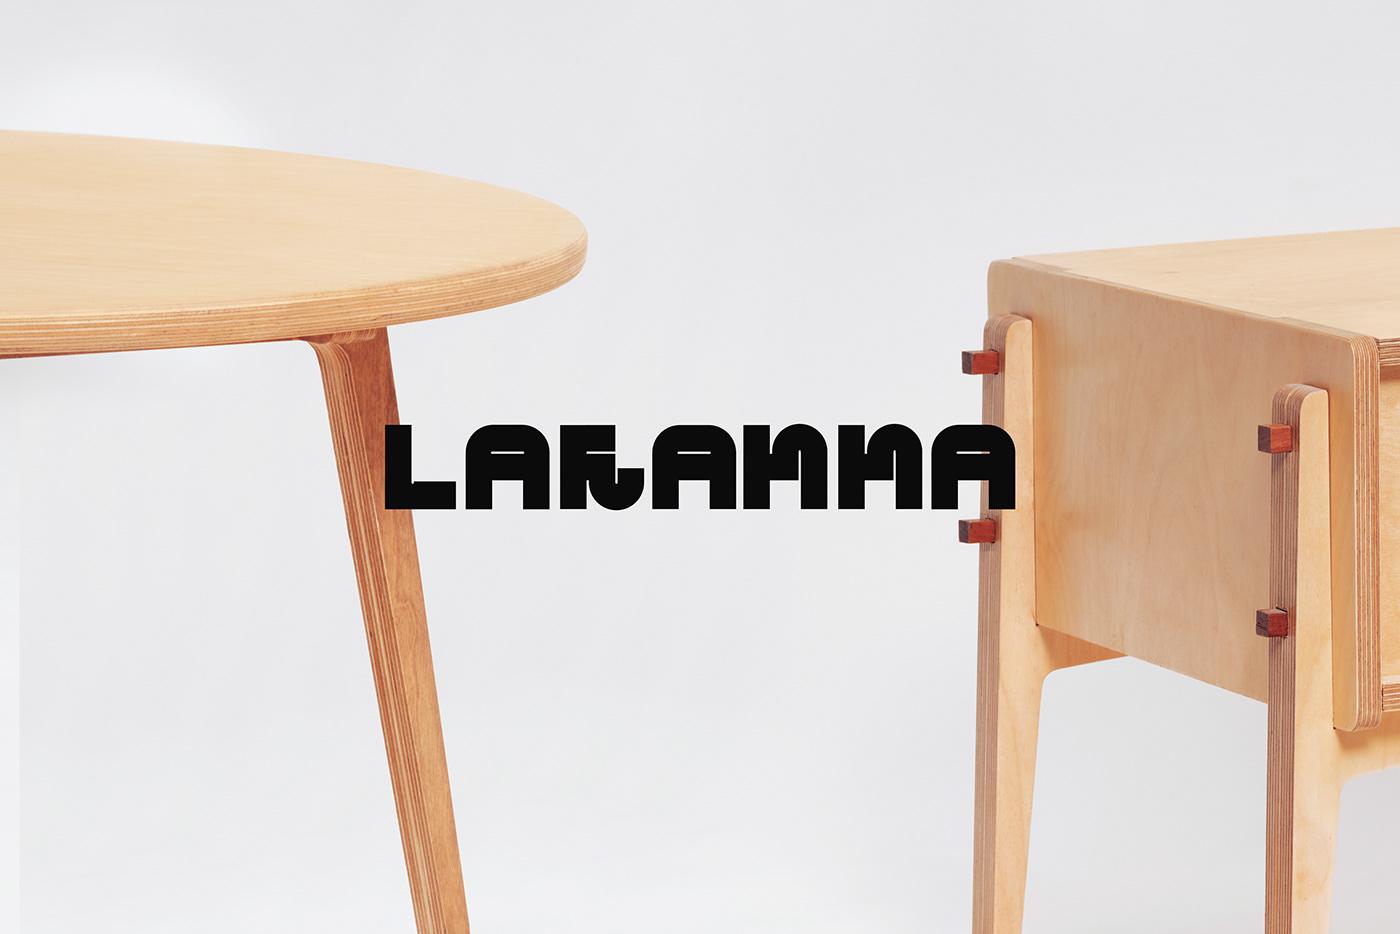 branding  byFutura Futura industrial design  lakanna mexico